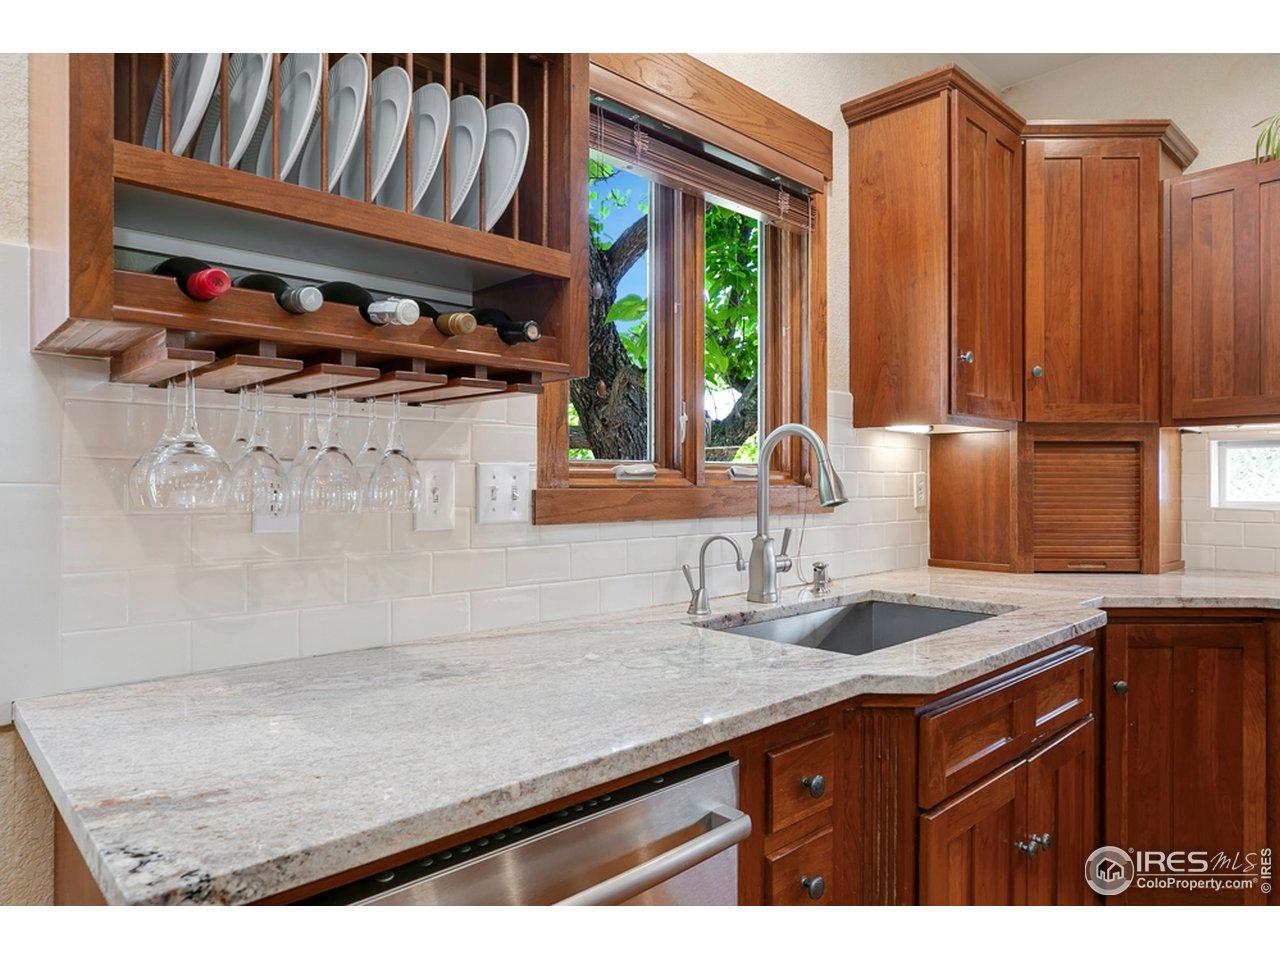 Oversized farmhouse sink overlooking the backyard and beautiful granite countertops